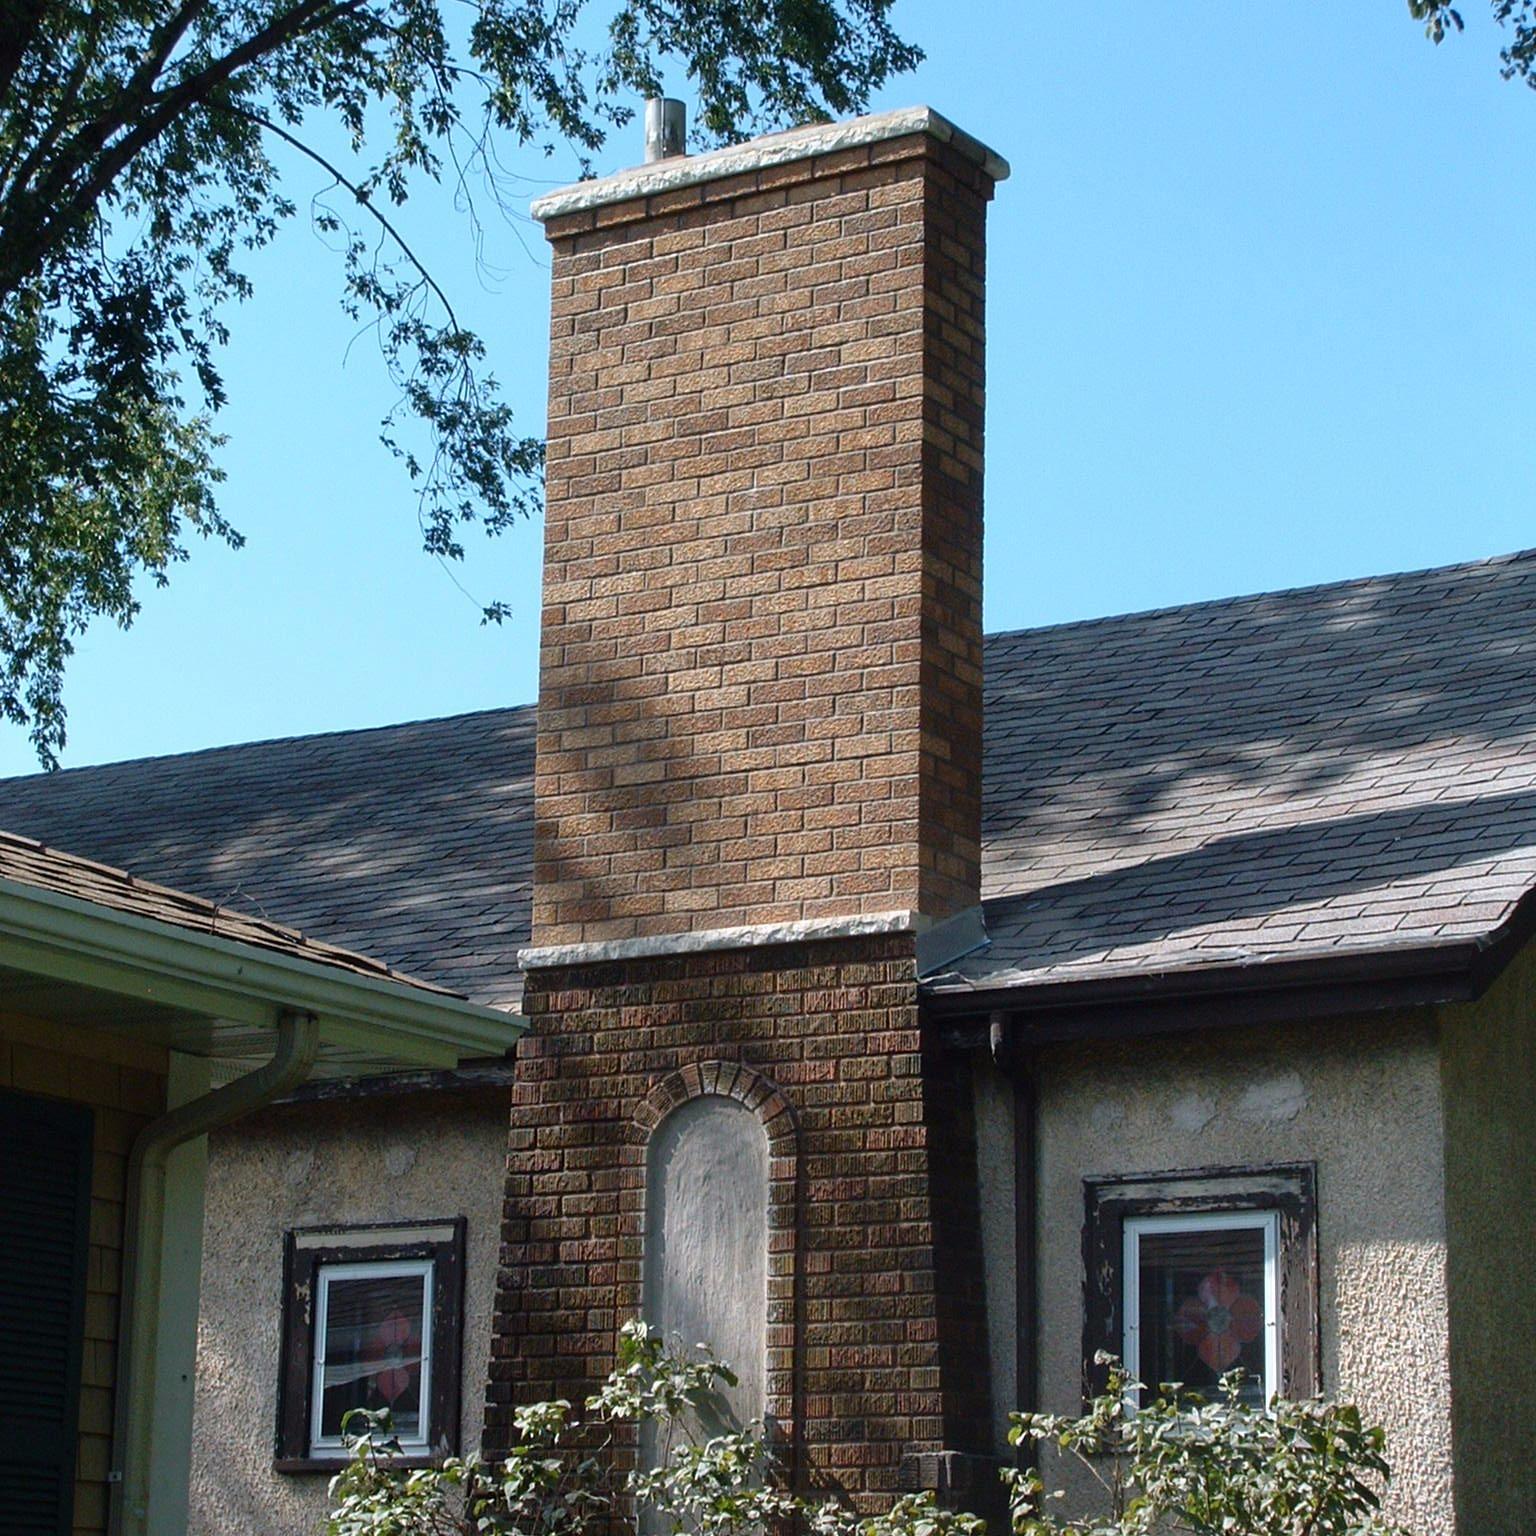 Robert G Larson & Son Brick & Stone, Inc.